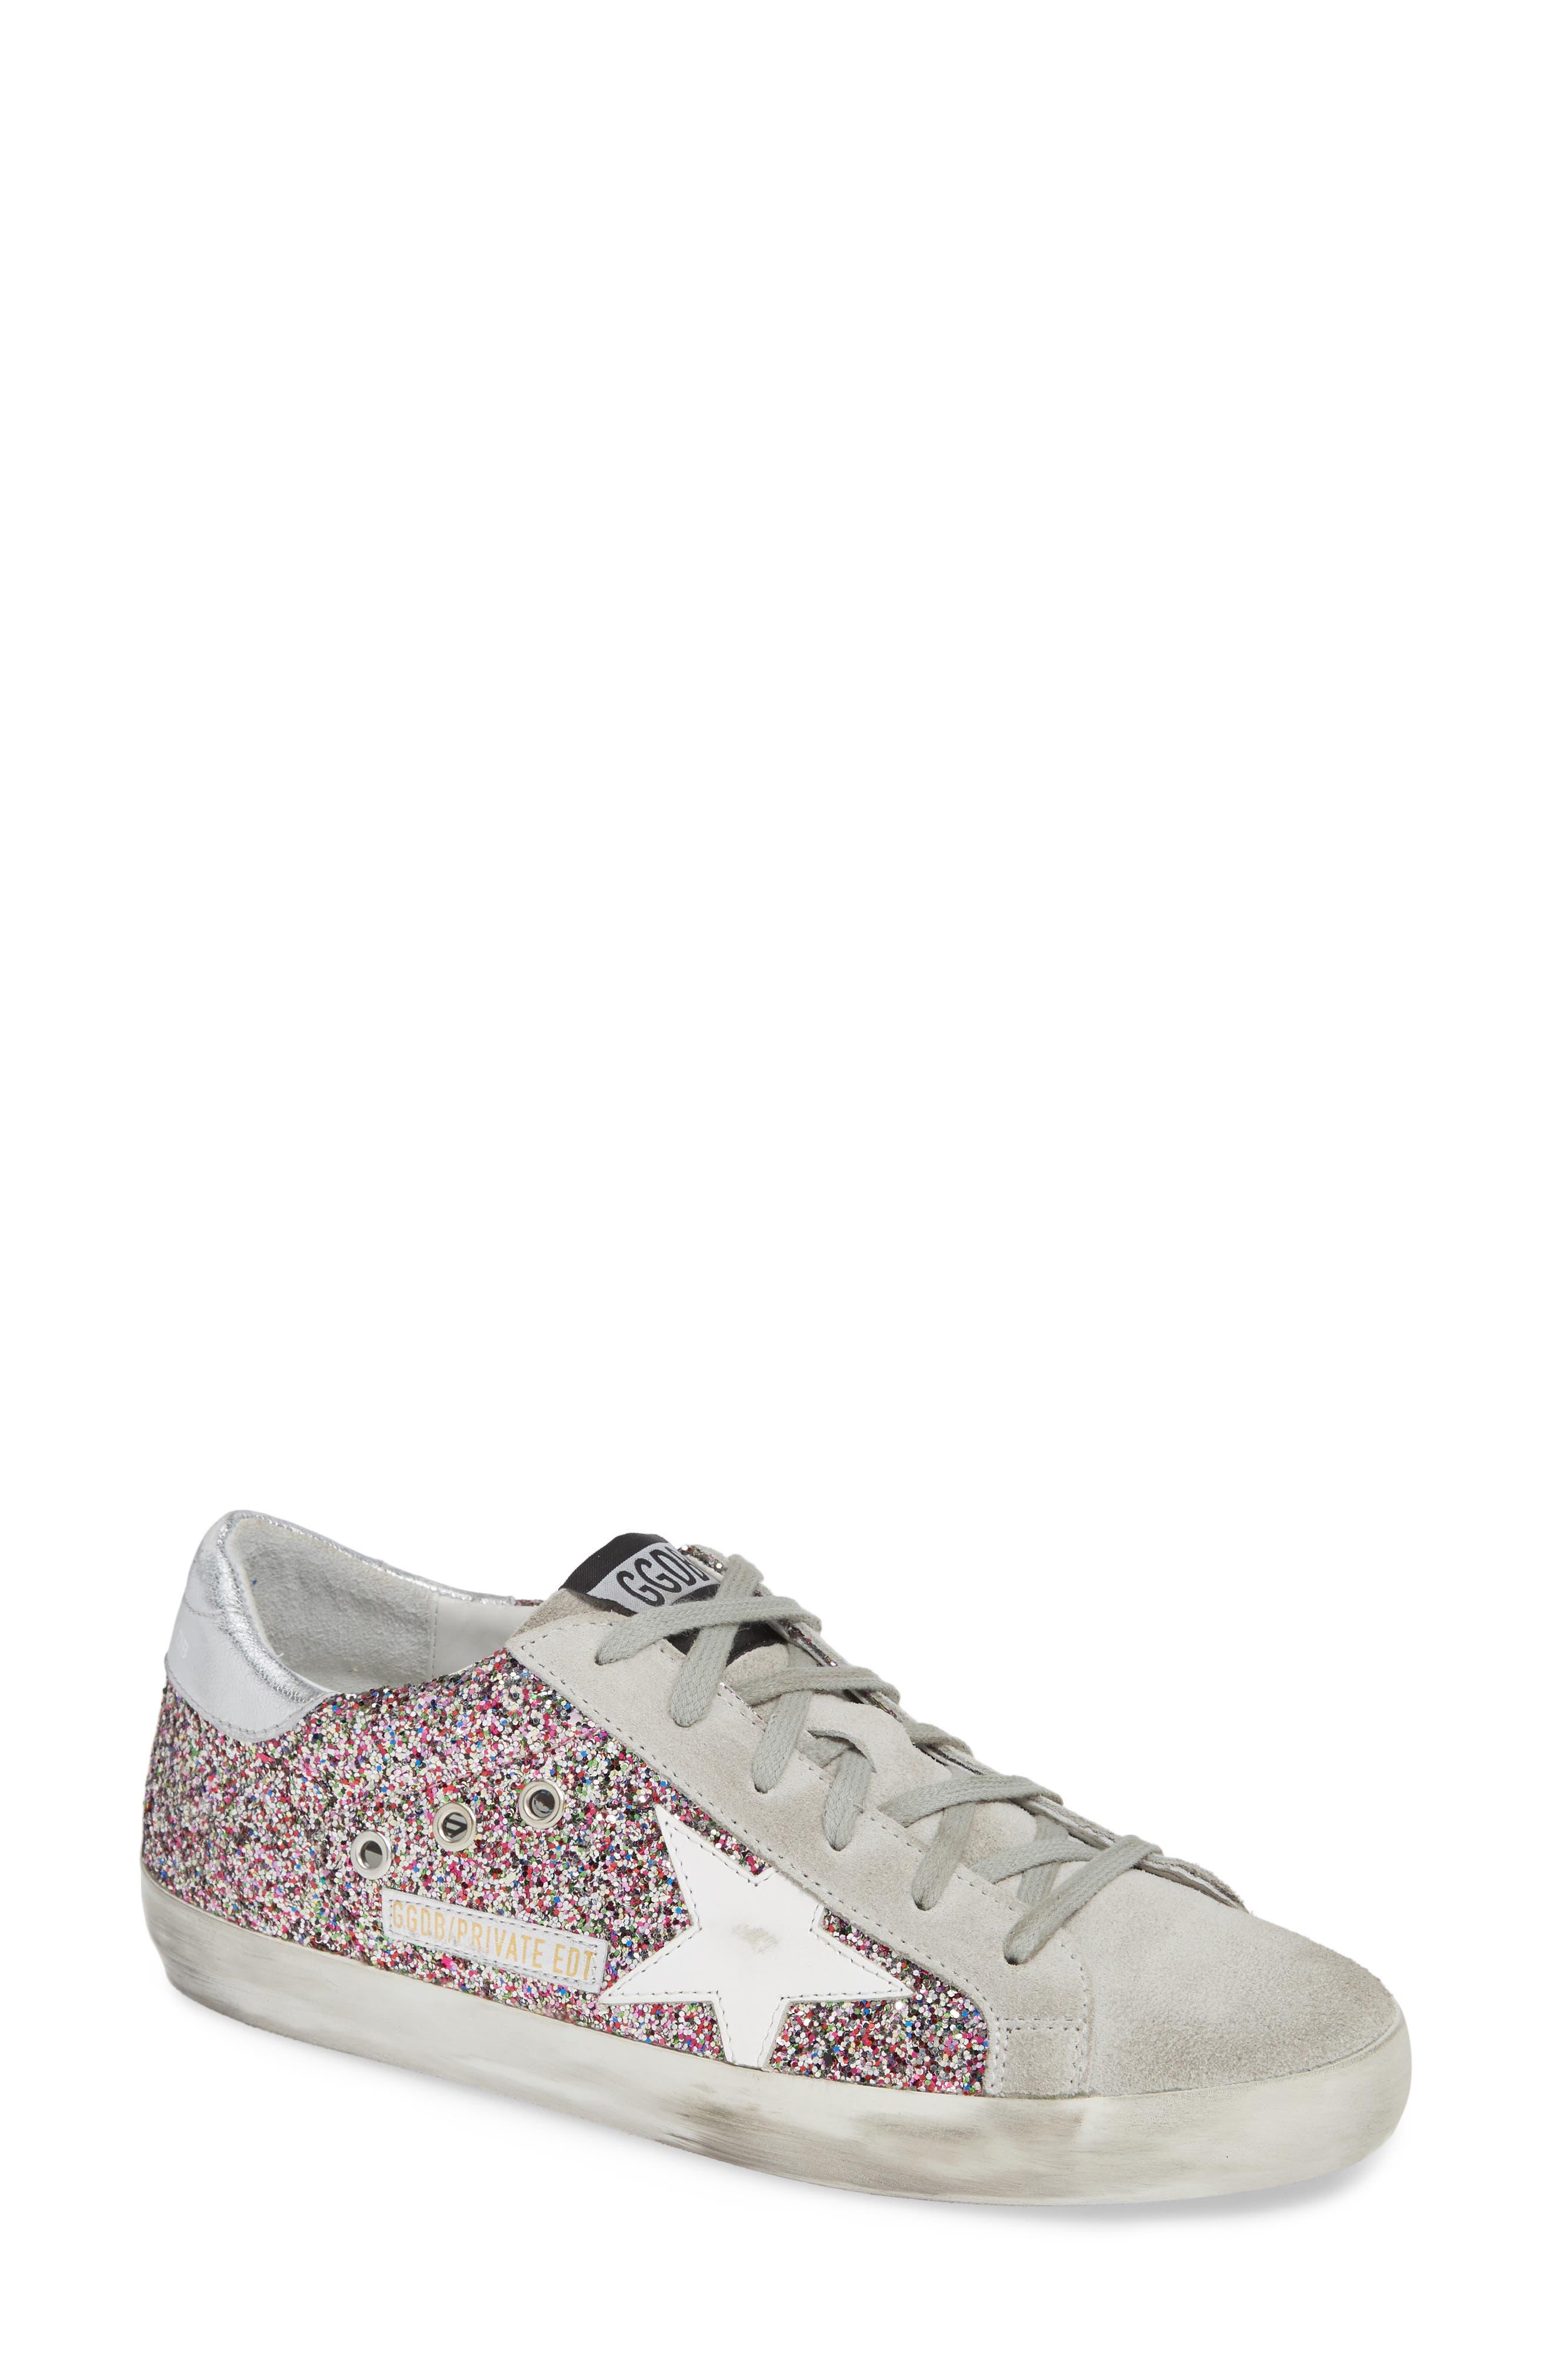 Superstar Glitter Sneaker, Main, color, PINK MULTI/ GREY